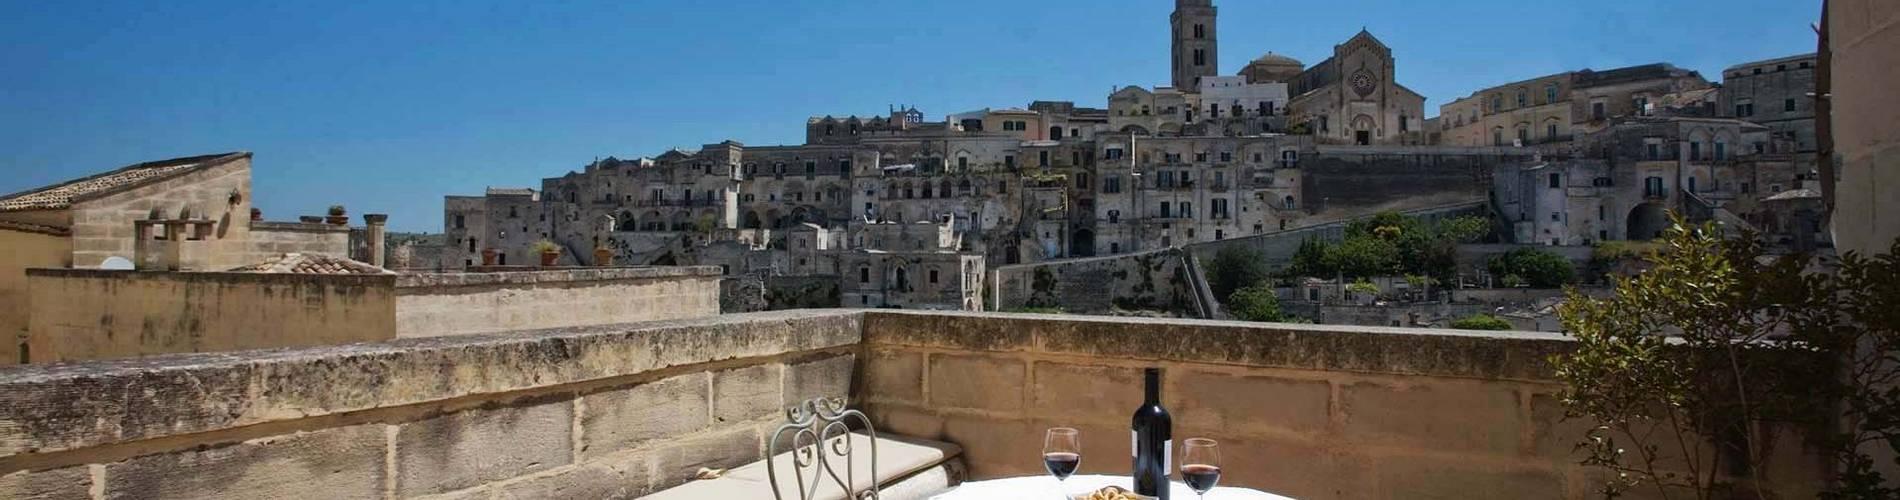 L'Hotel In Pietra, Basilicata, Italy (5).jpg